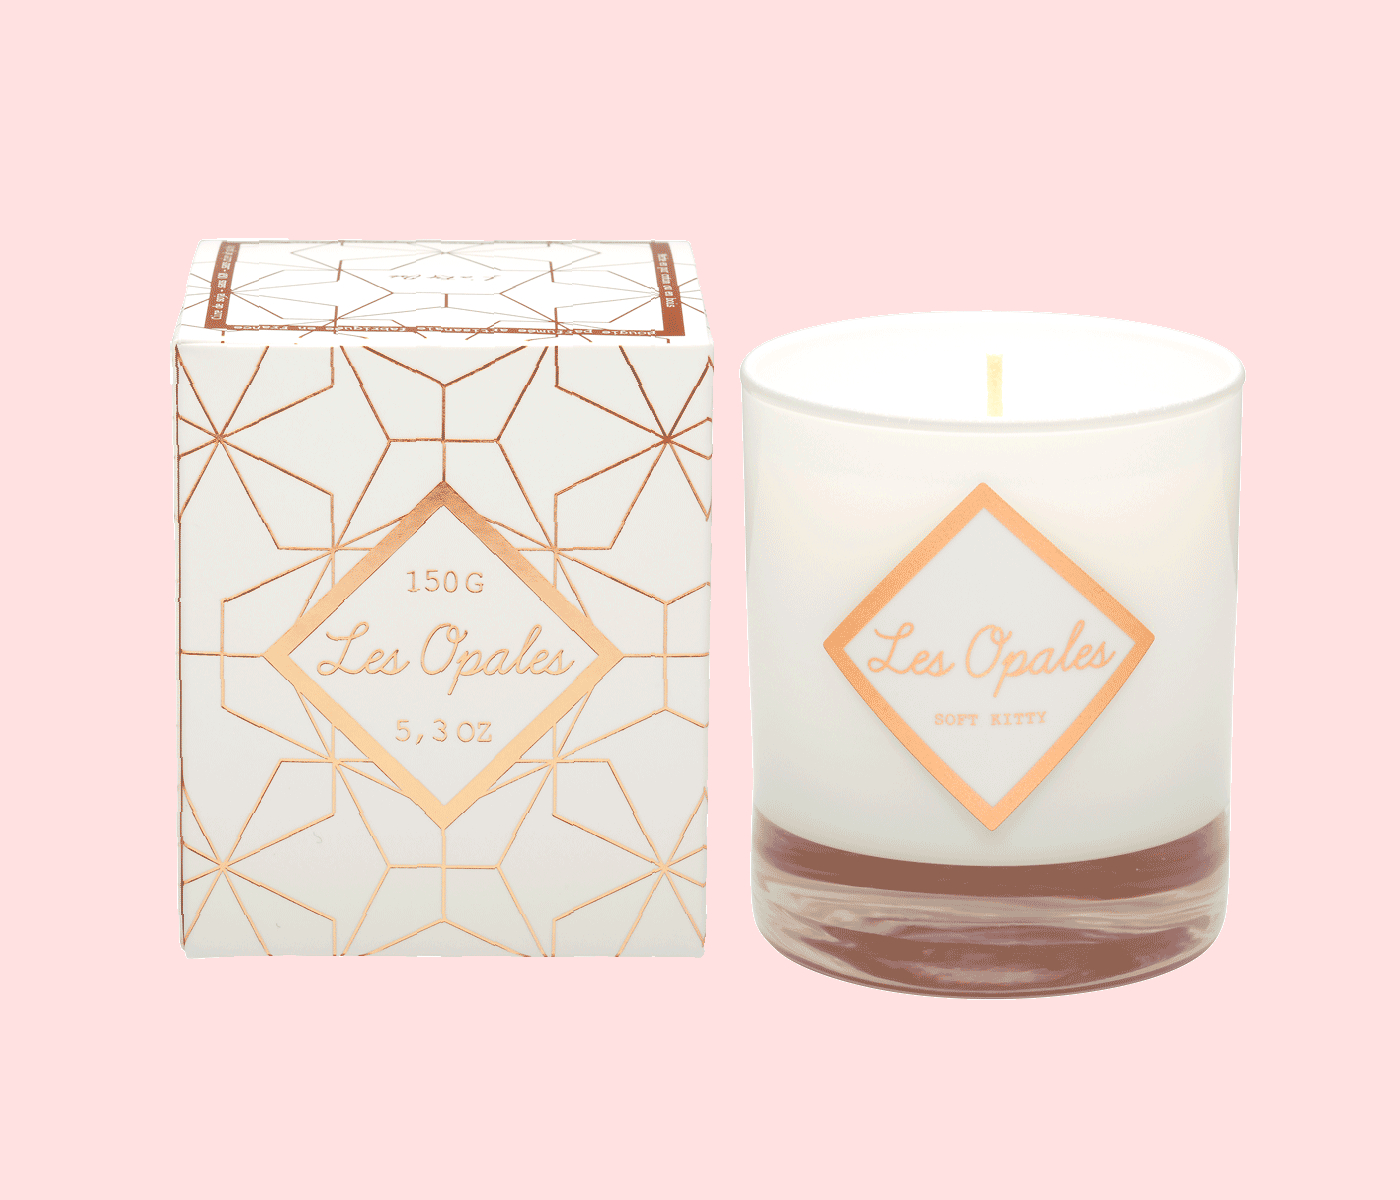 Bougies-parfumees-naturelles-lart-ose